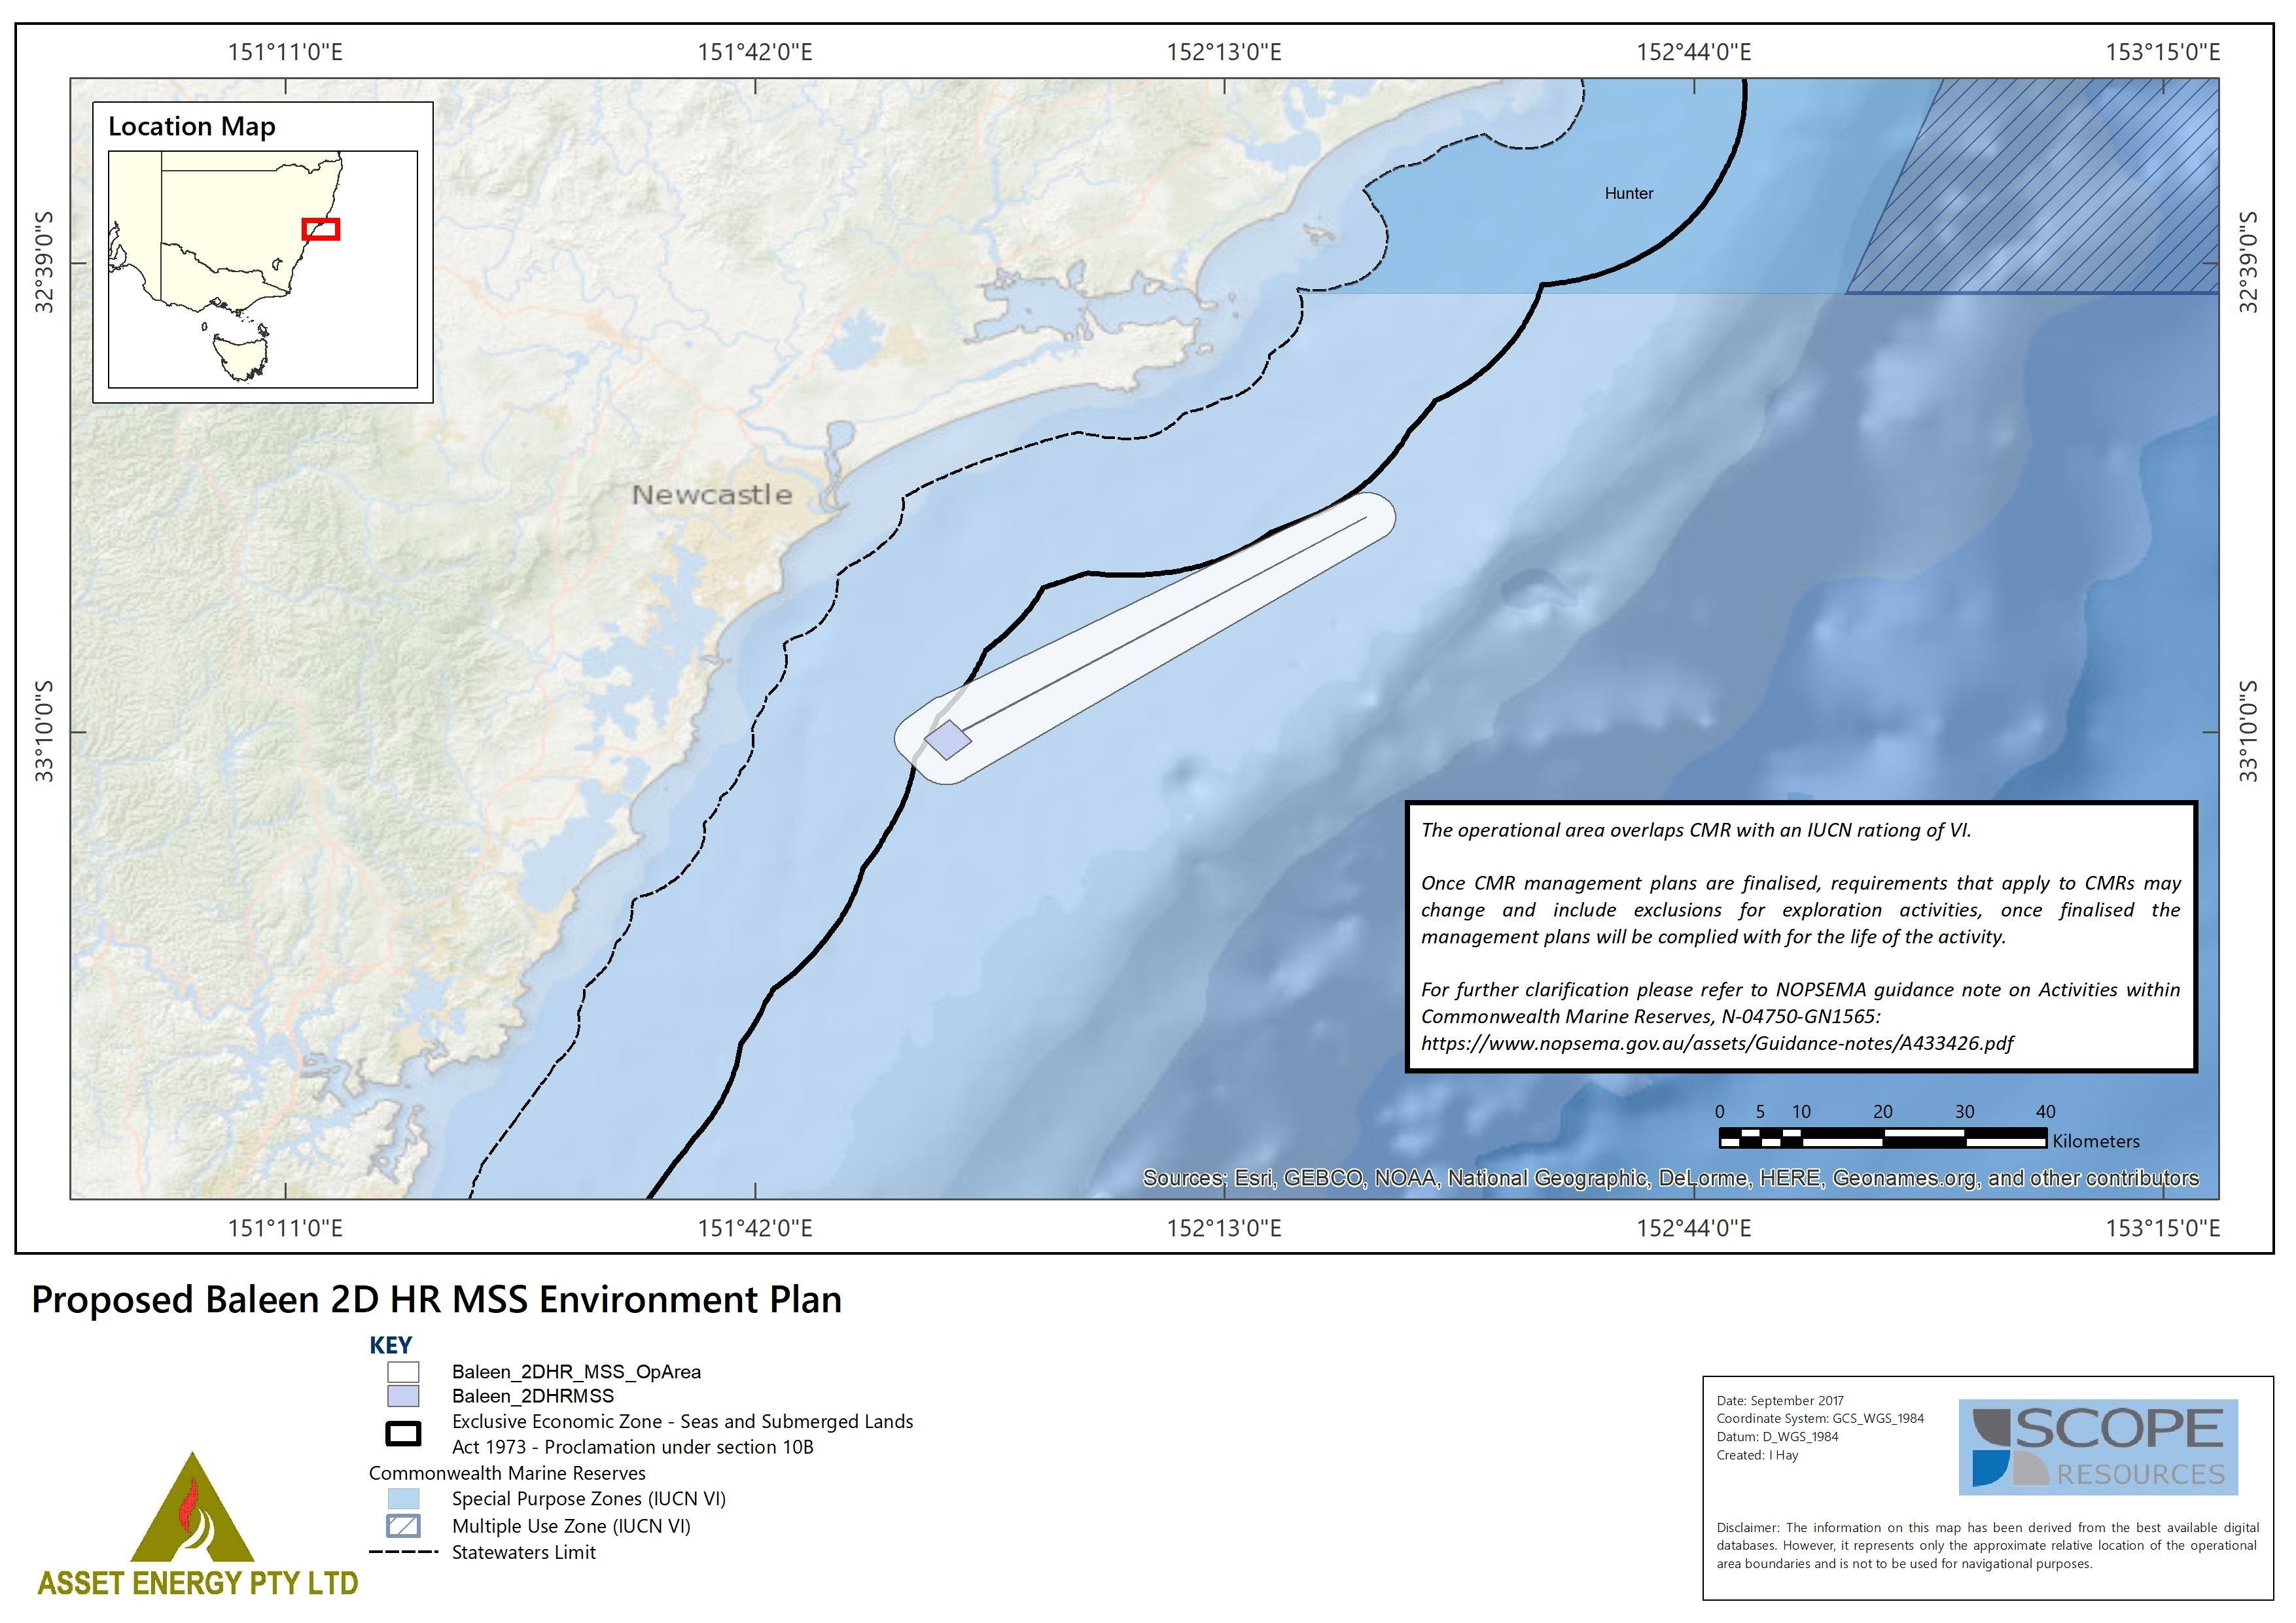 Location map - Activity: Baleen 2D HR Seismic Survey (refer to description)